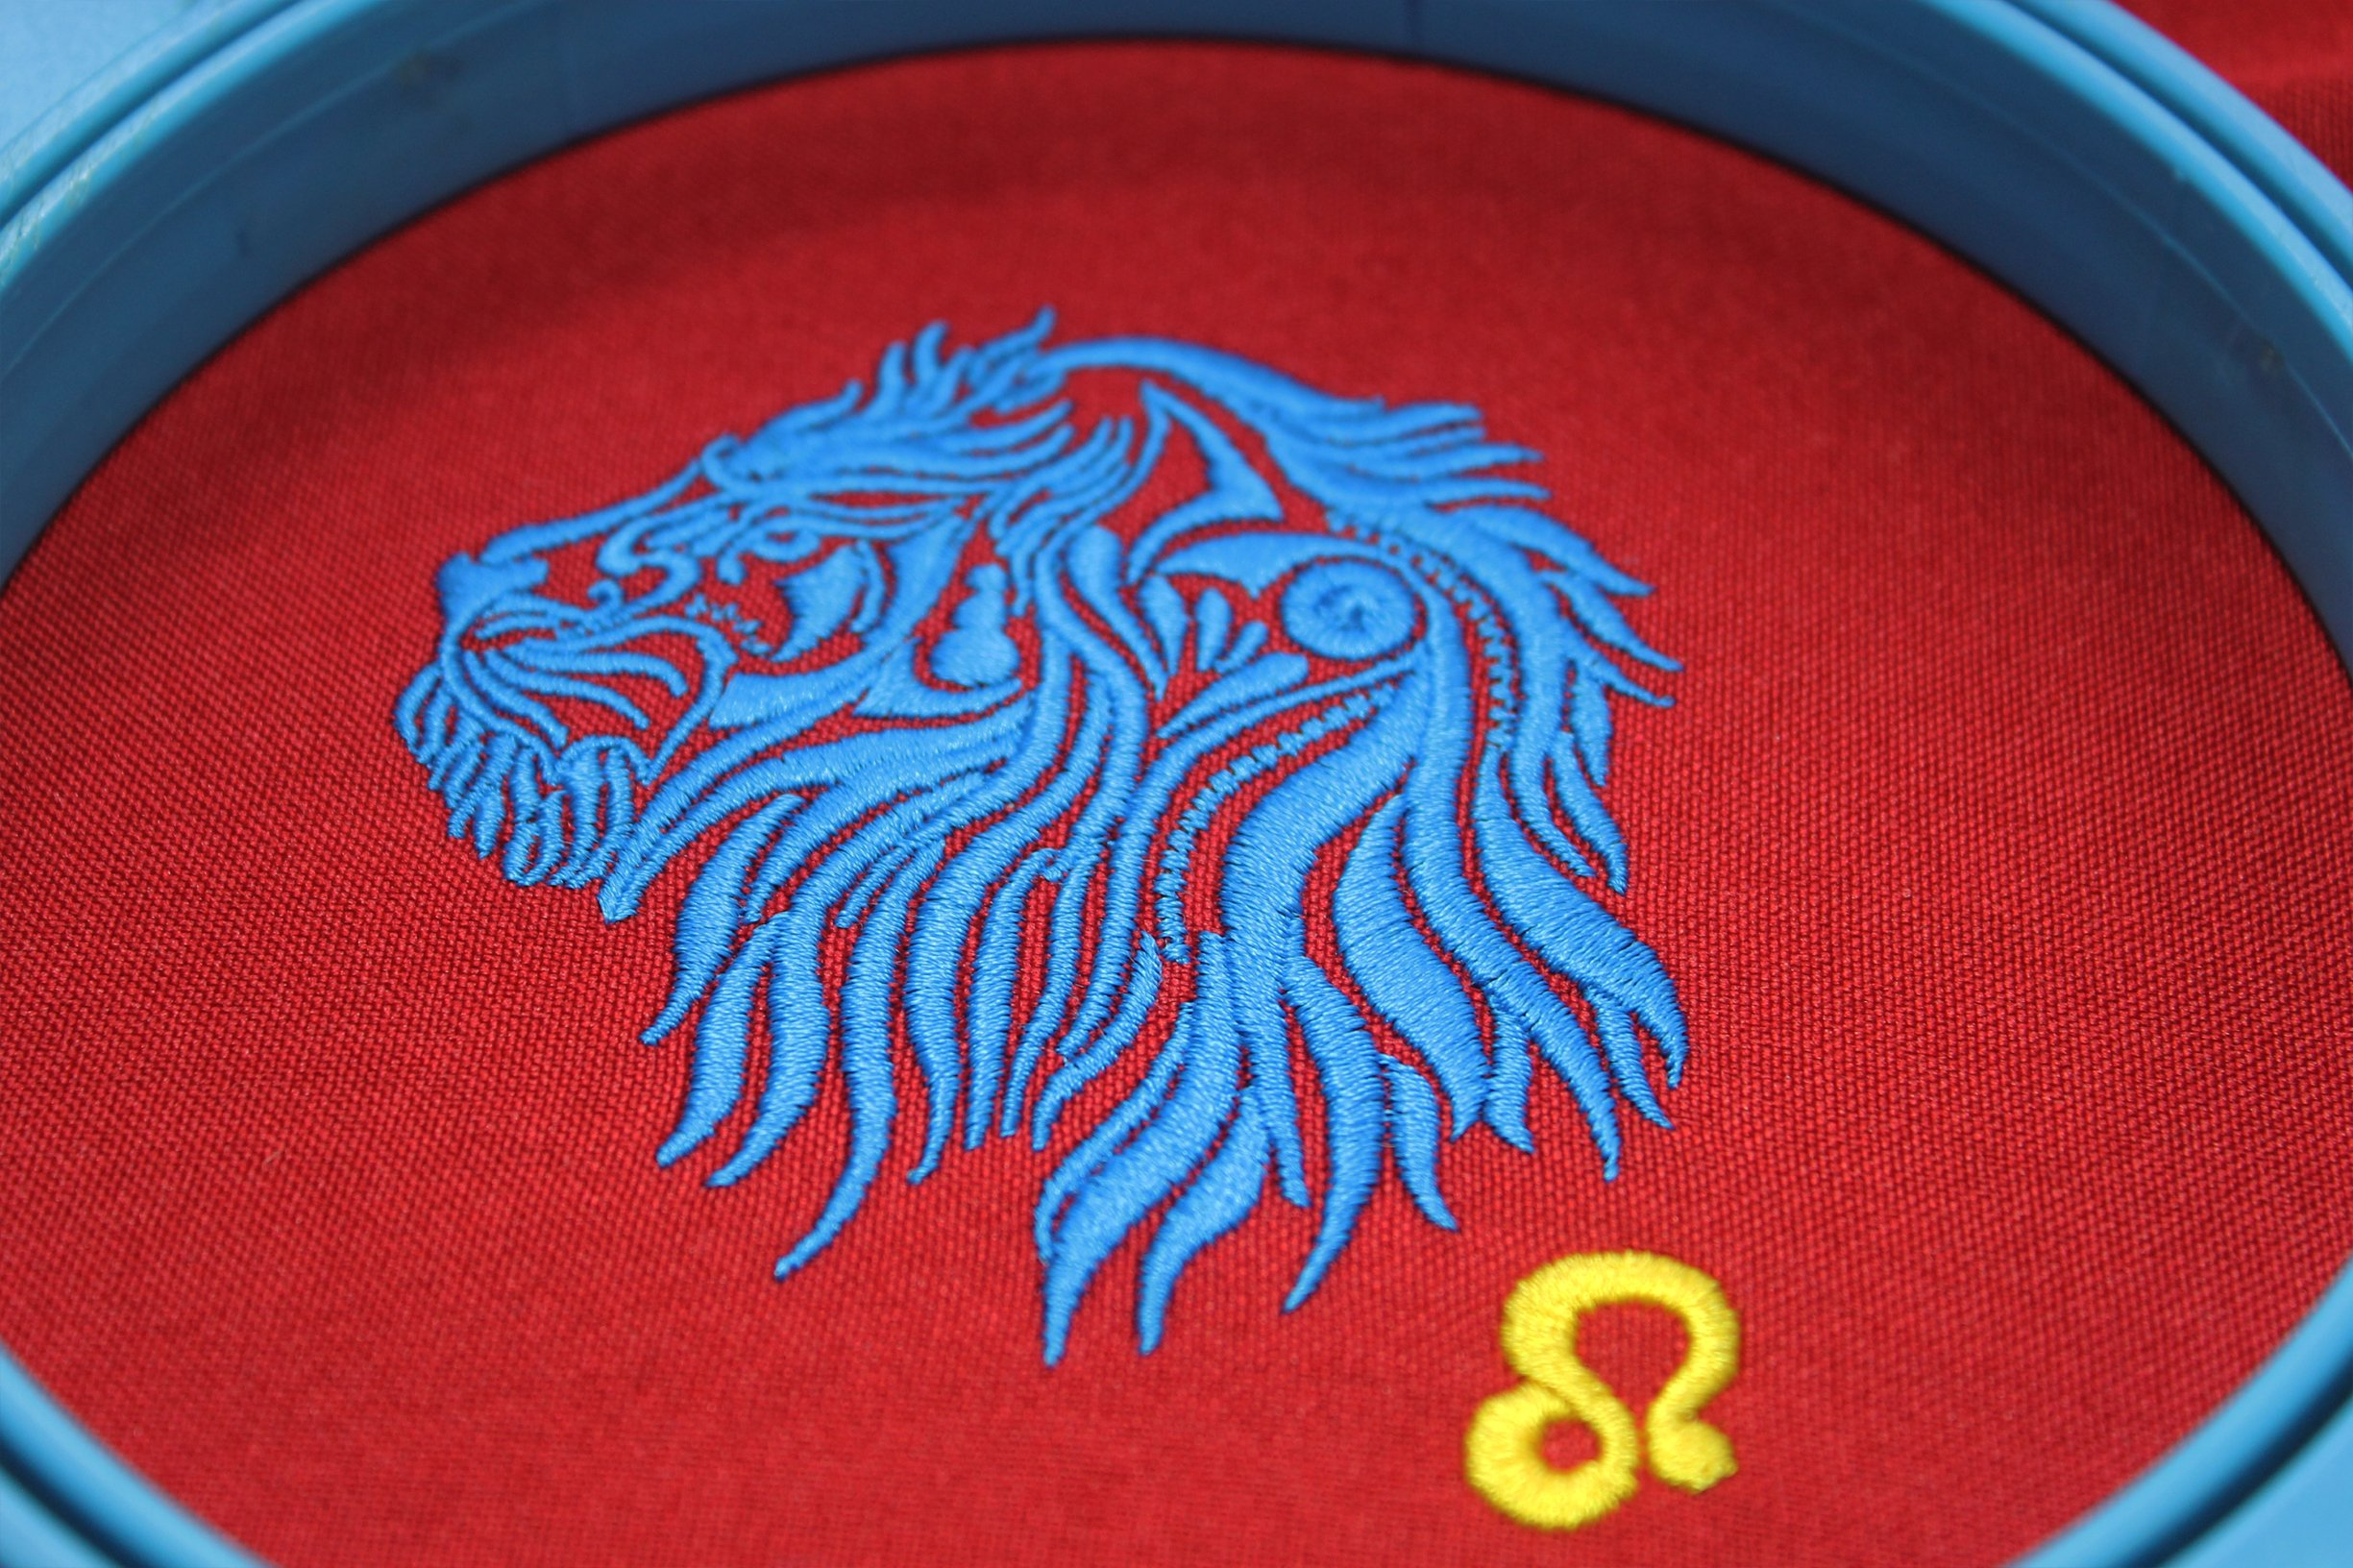 Leo Zodiac Sign - machine embroidery design, satin stitch example image 5